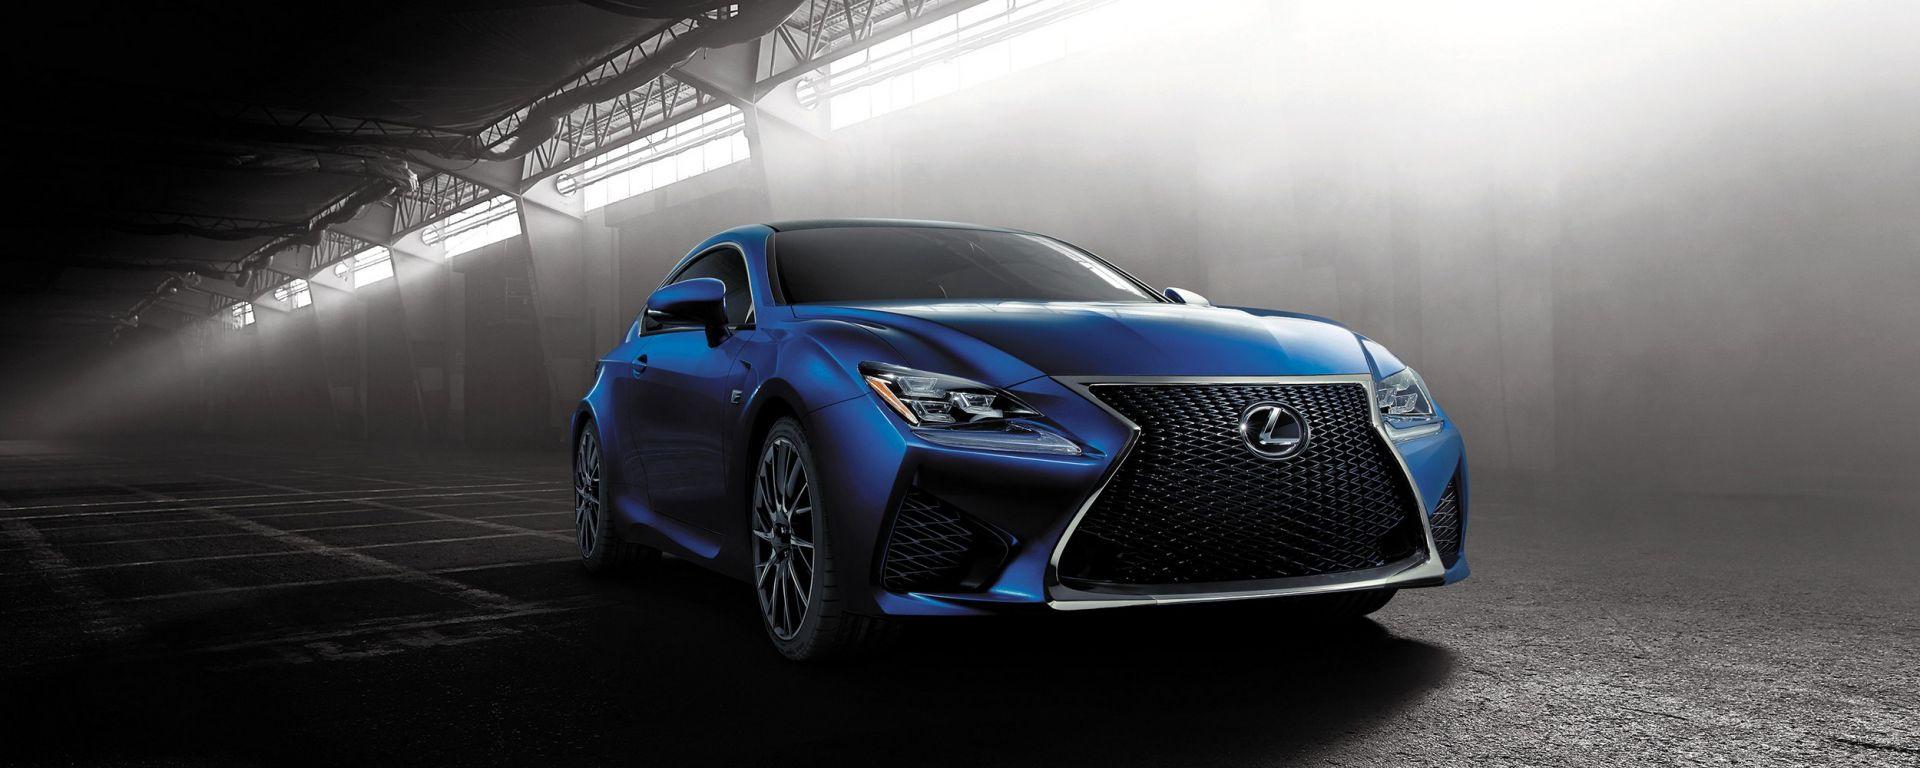 Lexus RC F: le nuove foto